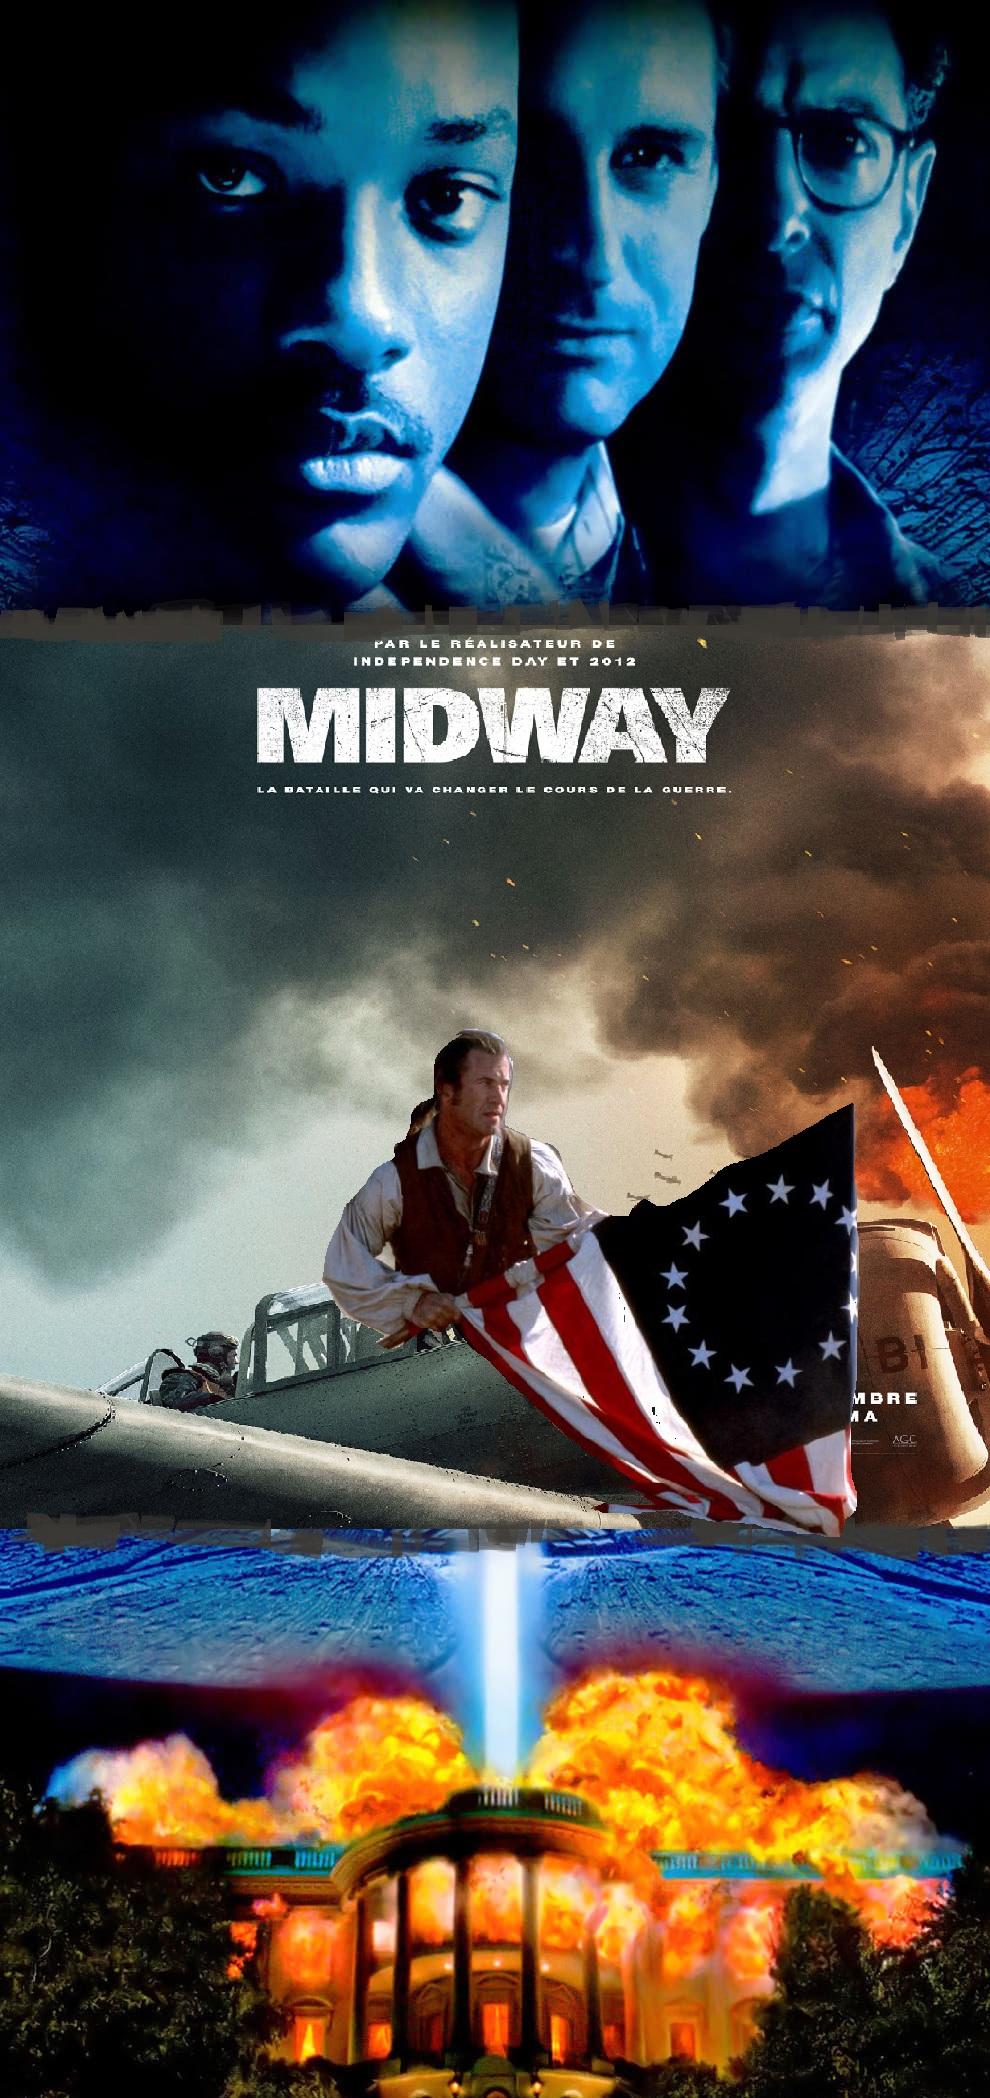 midway11.jpg